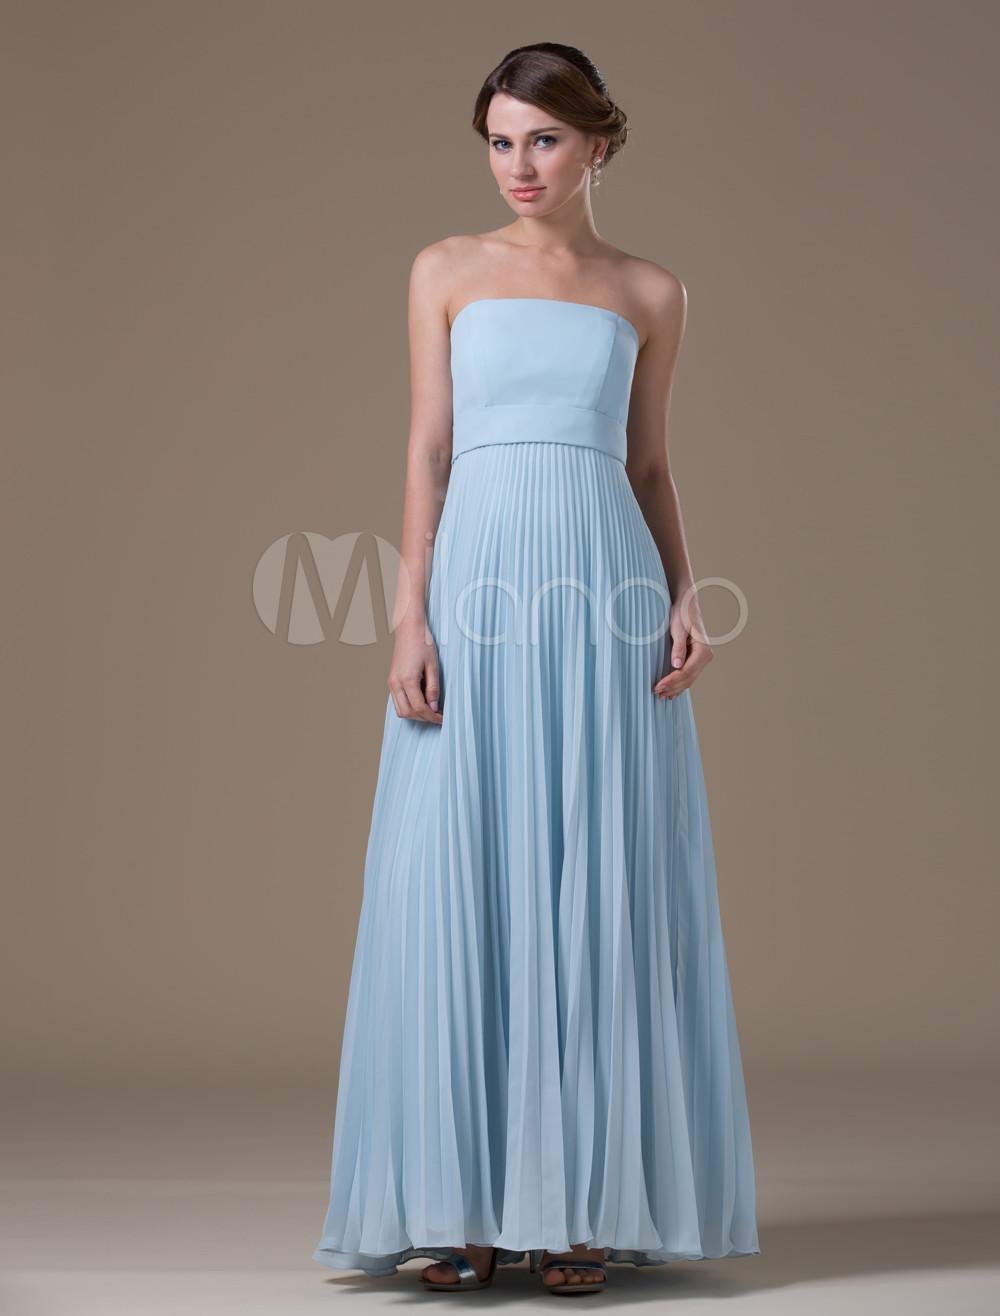 A-line Sage Chiffon Maternity Bridesmaid Dress with Empire Waist